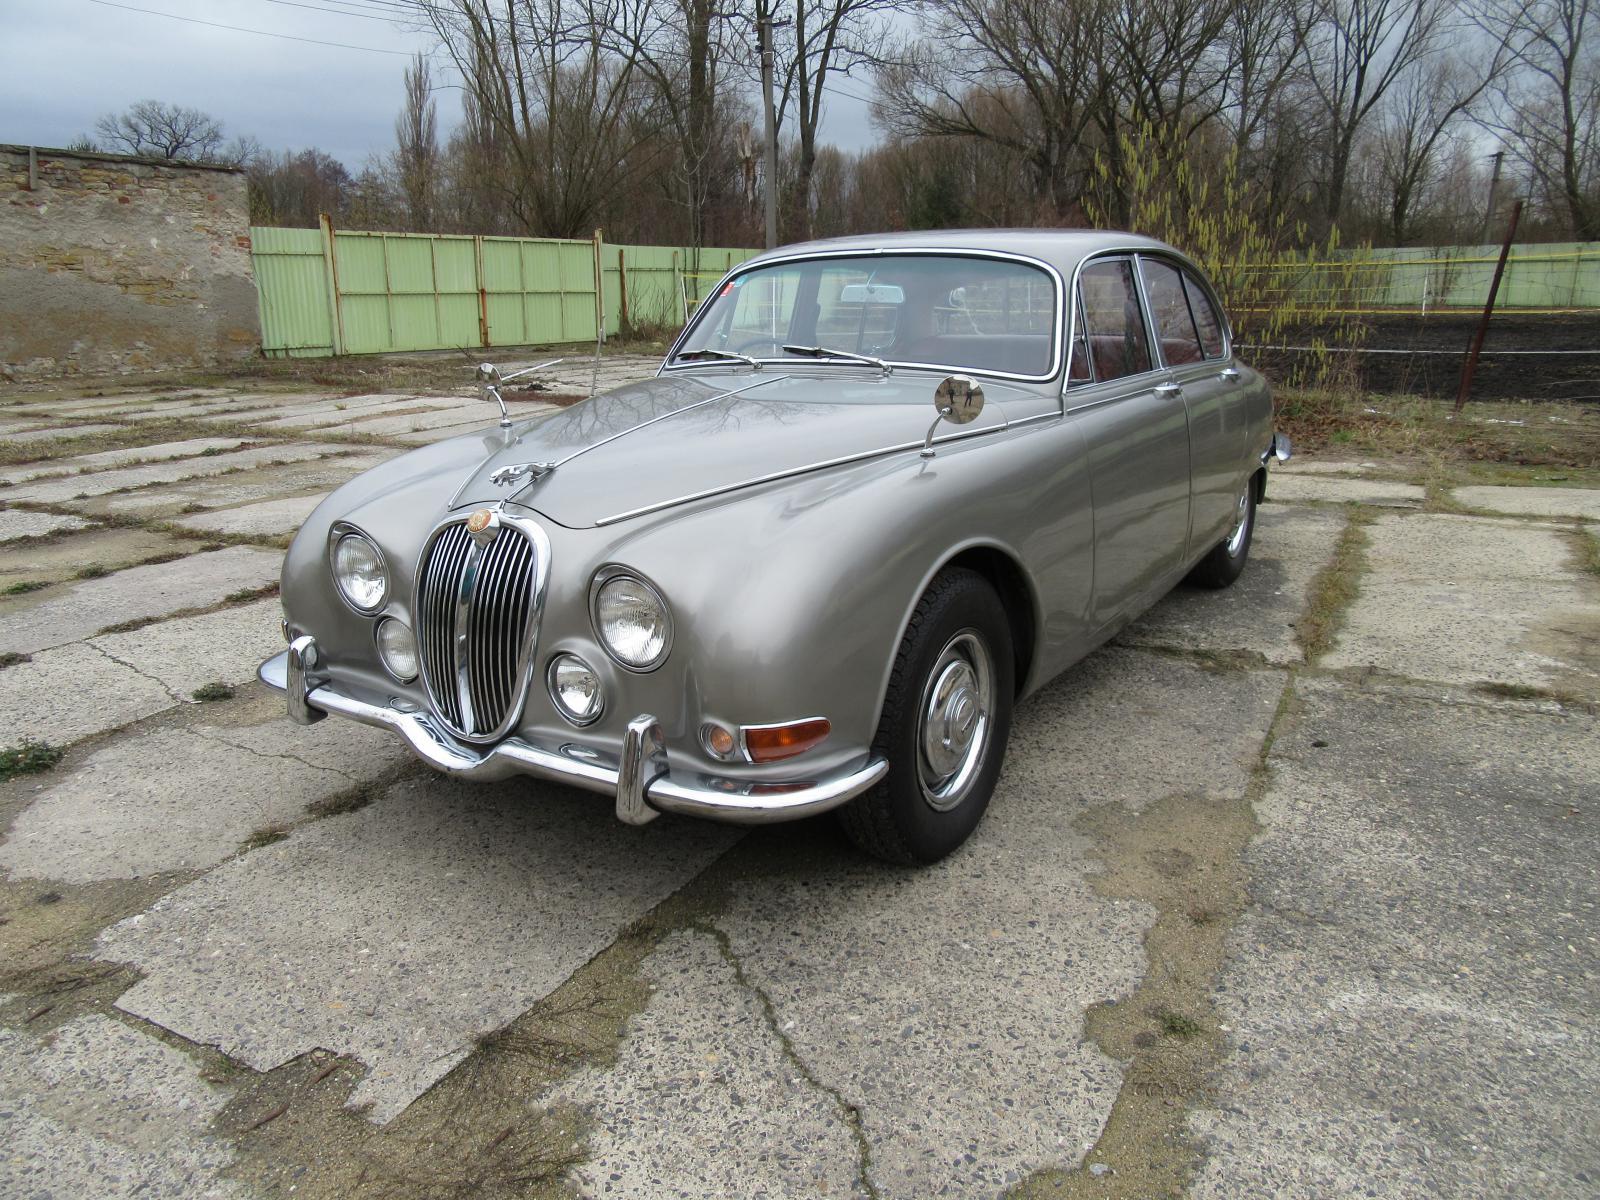 1966 Jaguar S-Type (1963) 3.4 benzín 156 kW